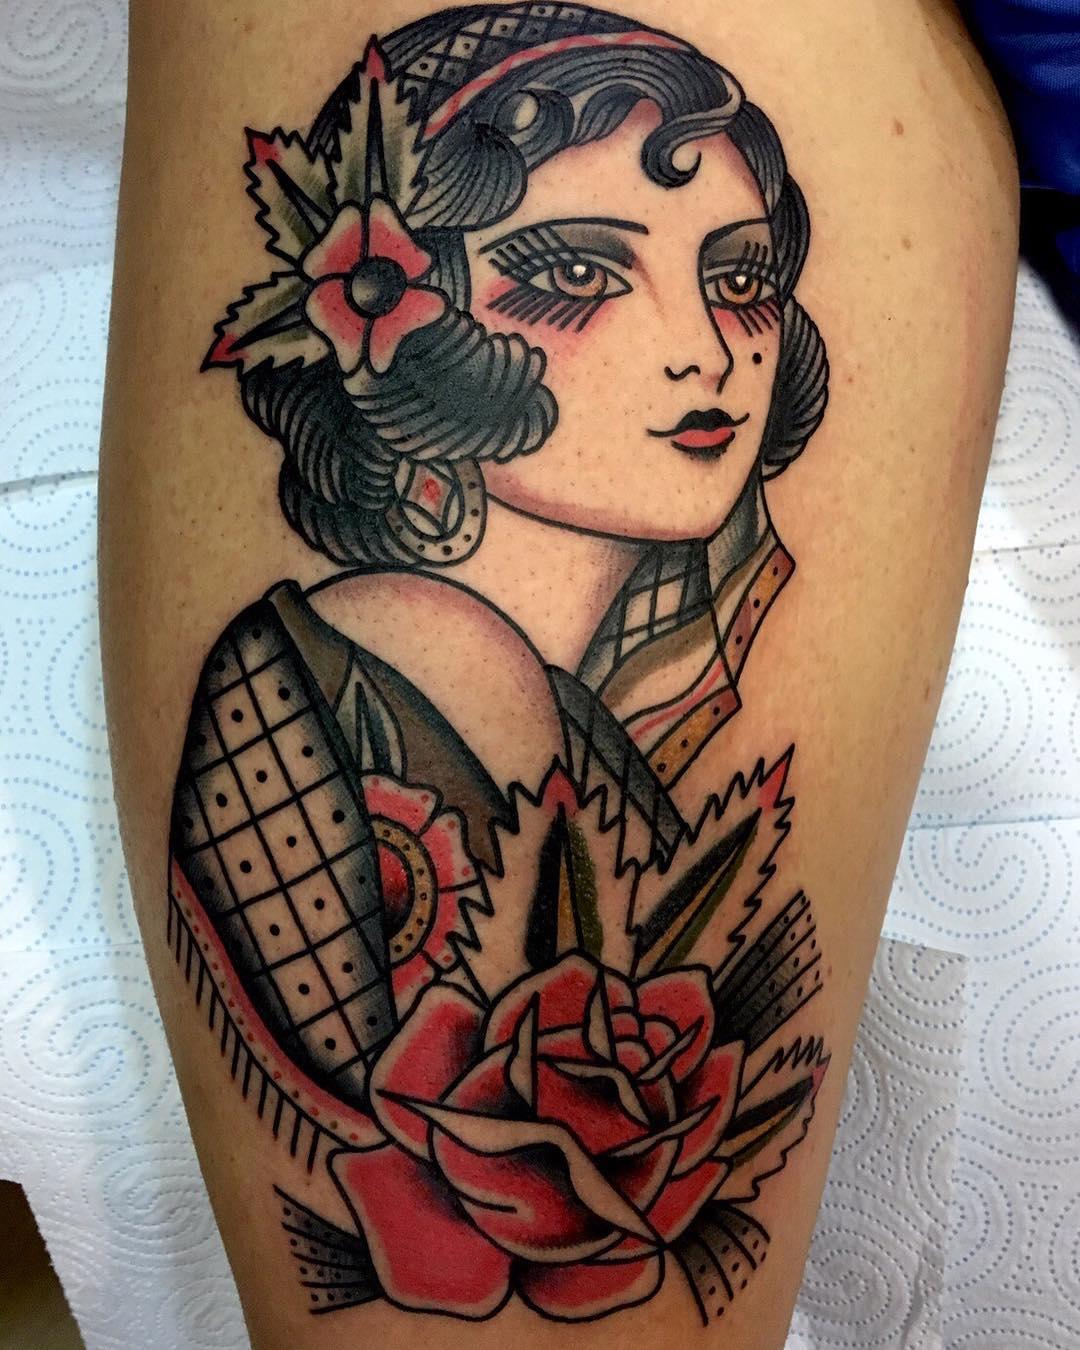 tattooart,art,artistic,old,oldschollshit,custommade,owl,tabasco,berlintattoo,barcelonatattoo,ibizatattoo,tabascotattooer,bestattooers,tradicionaltattooers,bestisbest,tatuajes,berlintattooers,ontheroad,classictattoo,oldlines,ciudadreal,malagatattooconvention,tradworkers,tradtattoo,follow4follow,followme,ciudadreal,castillalamancha,puertollano,oldlines,radtrad,newyork